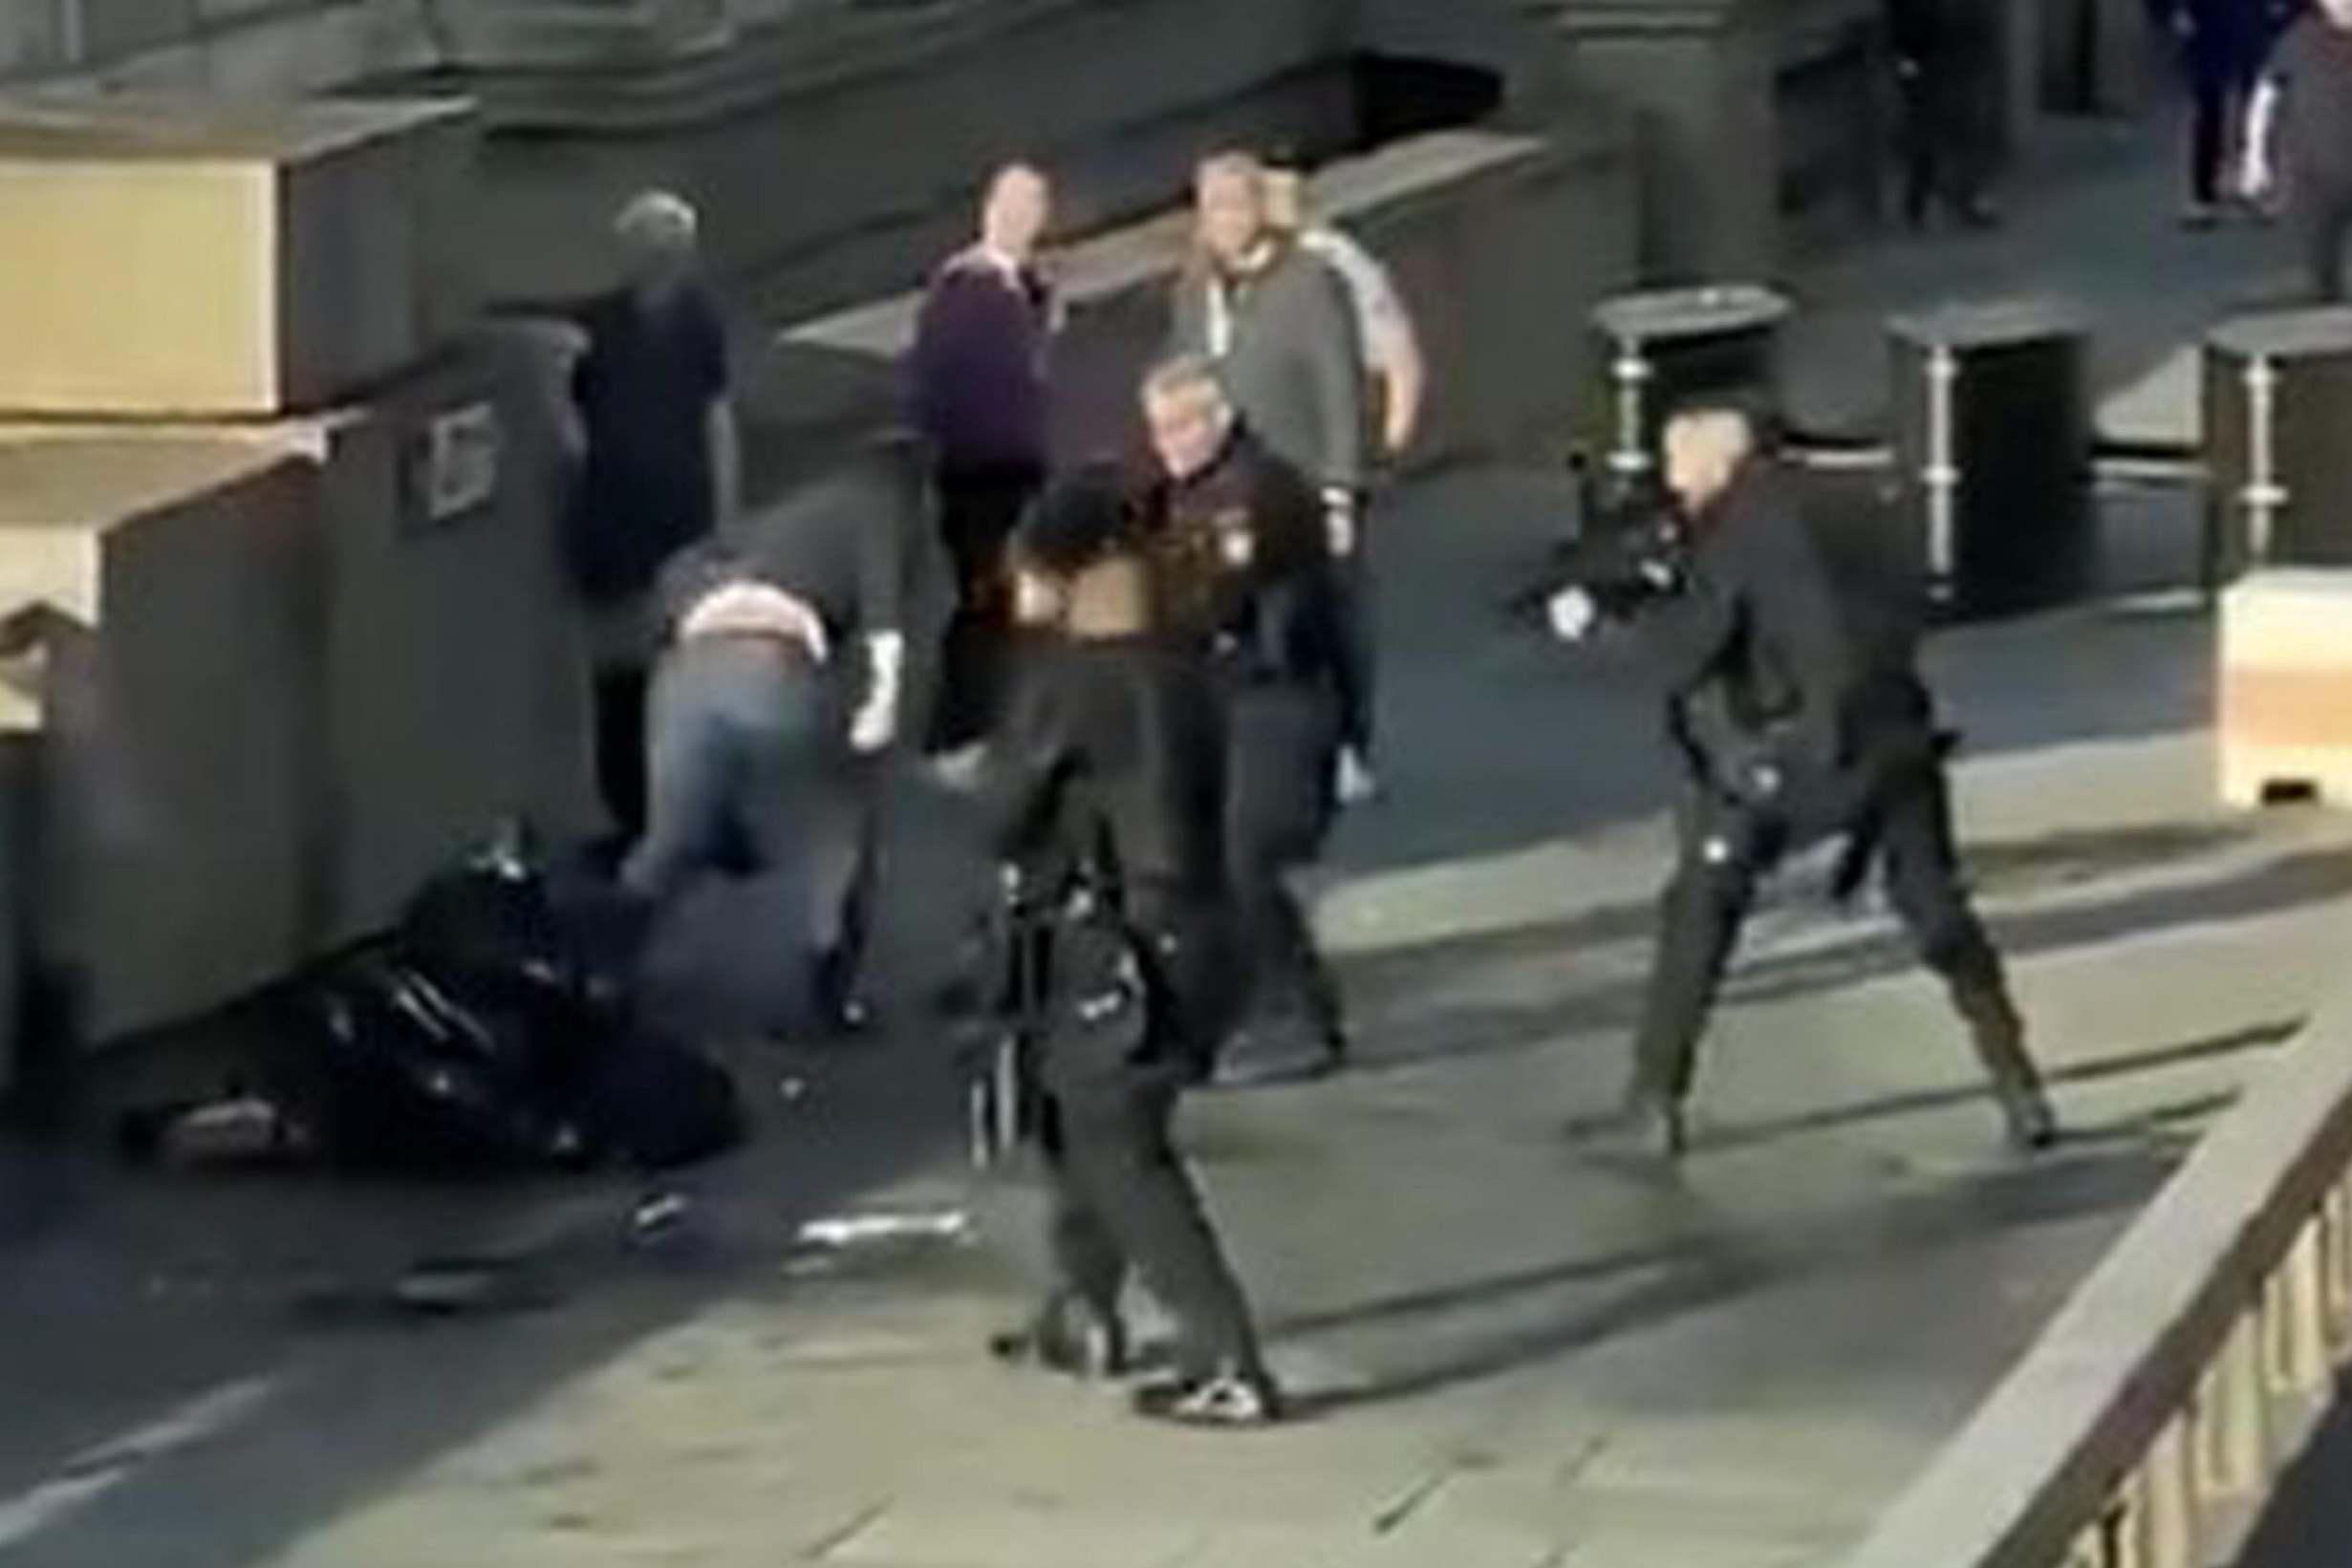 London Bridge, Ataque, Disparos, Agresor, Atacante, Asesino, Apuñala, Heridos, Muertos,